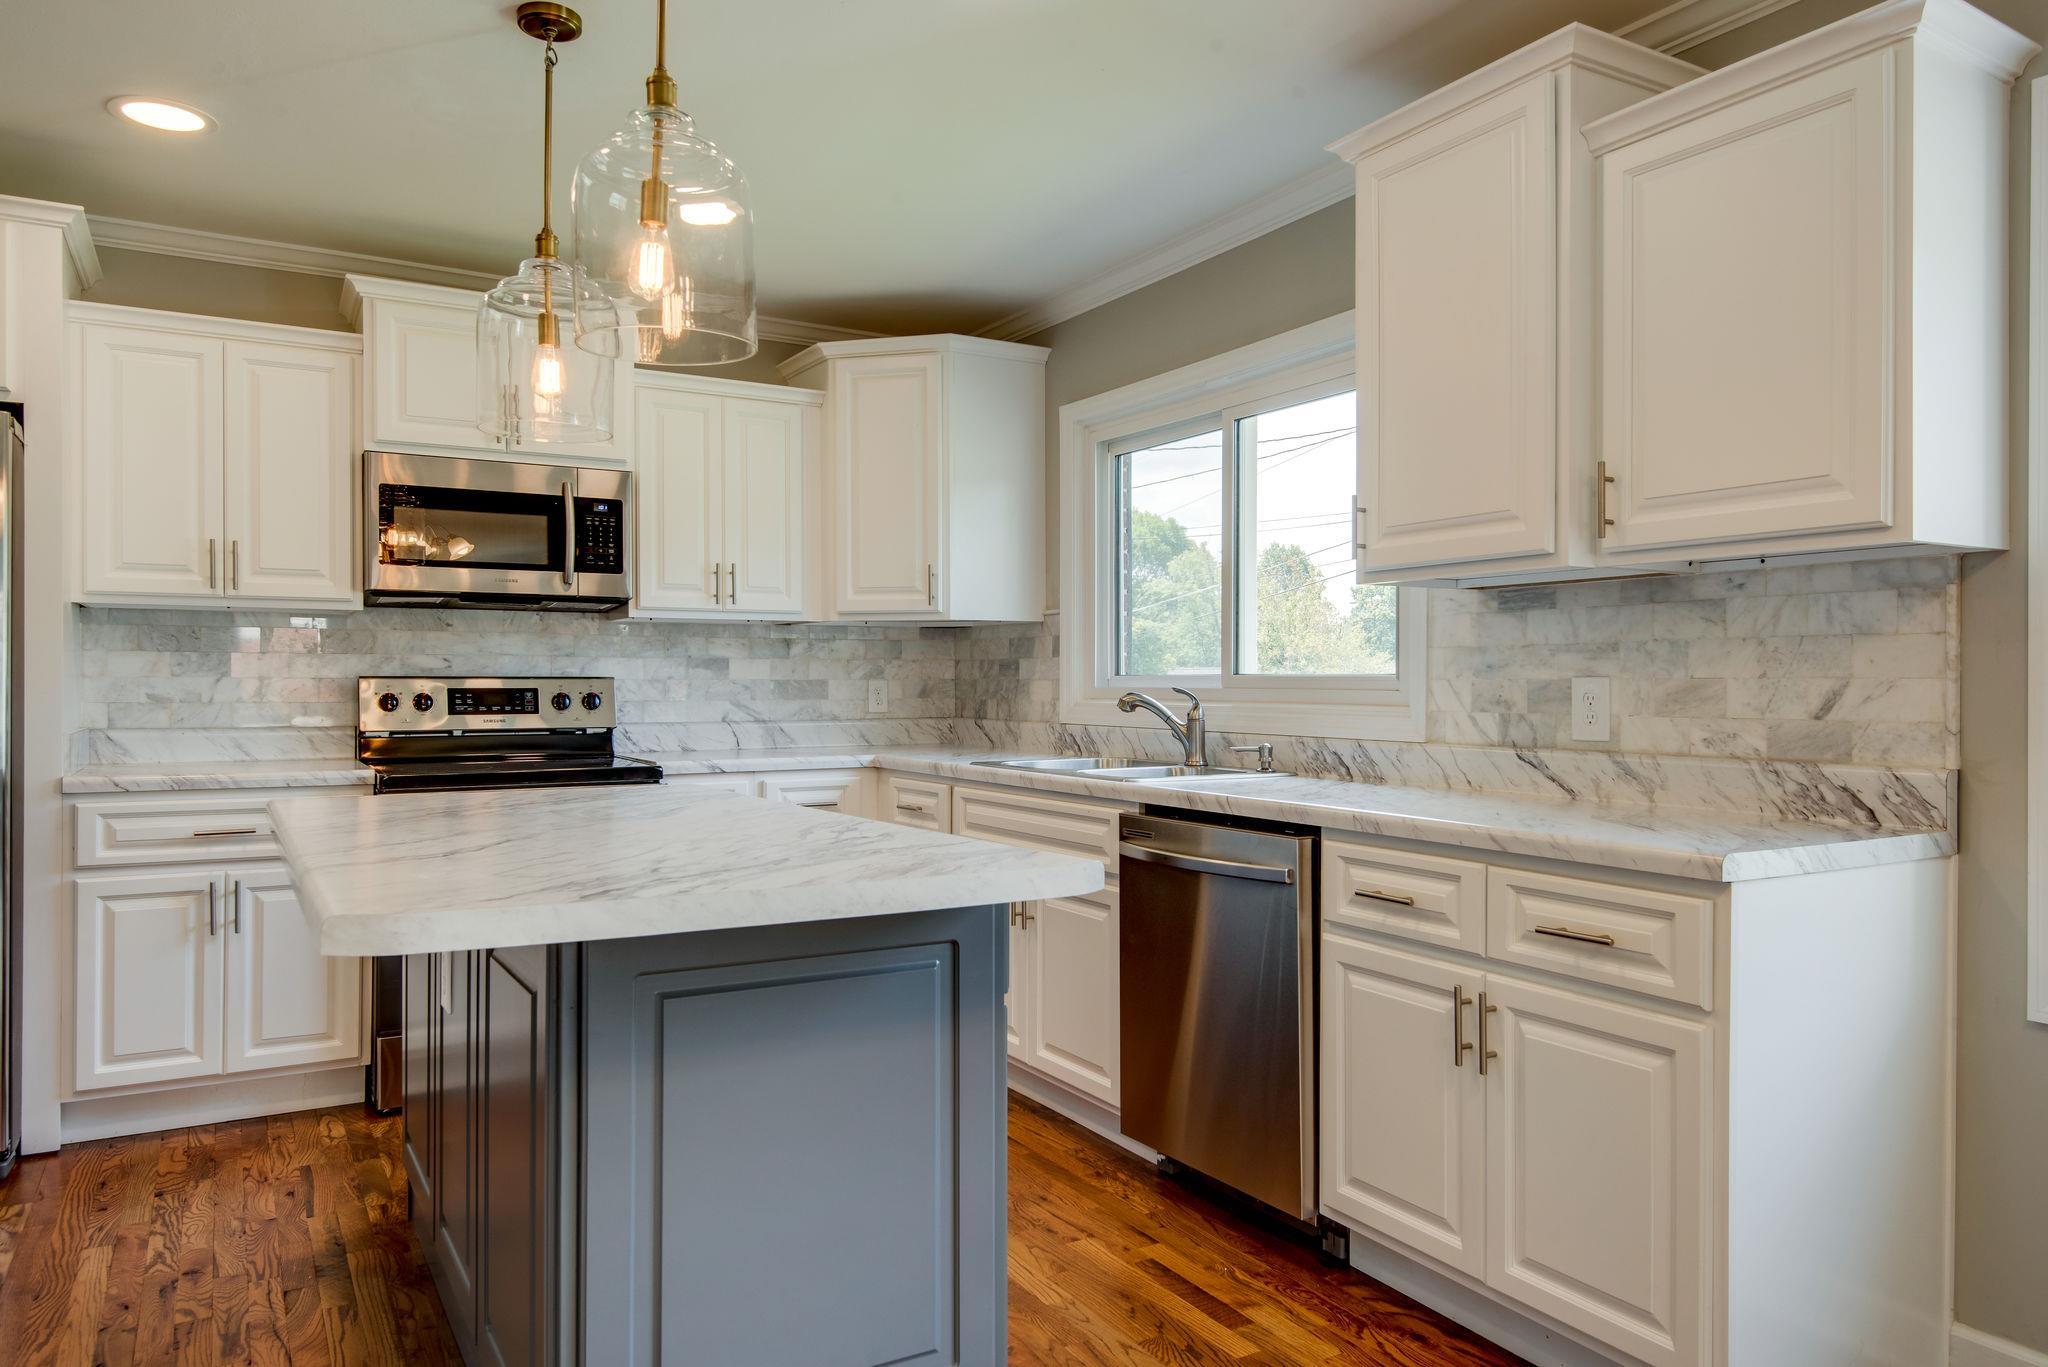 1609 June Ave, Shelbyville, TN 37160 - Shelbyville, TN real estate listing